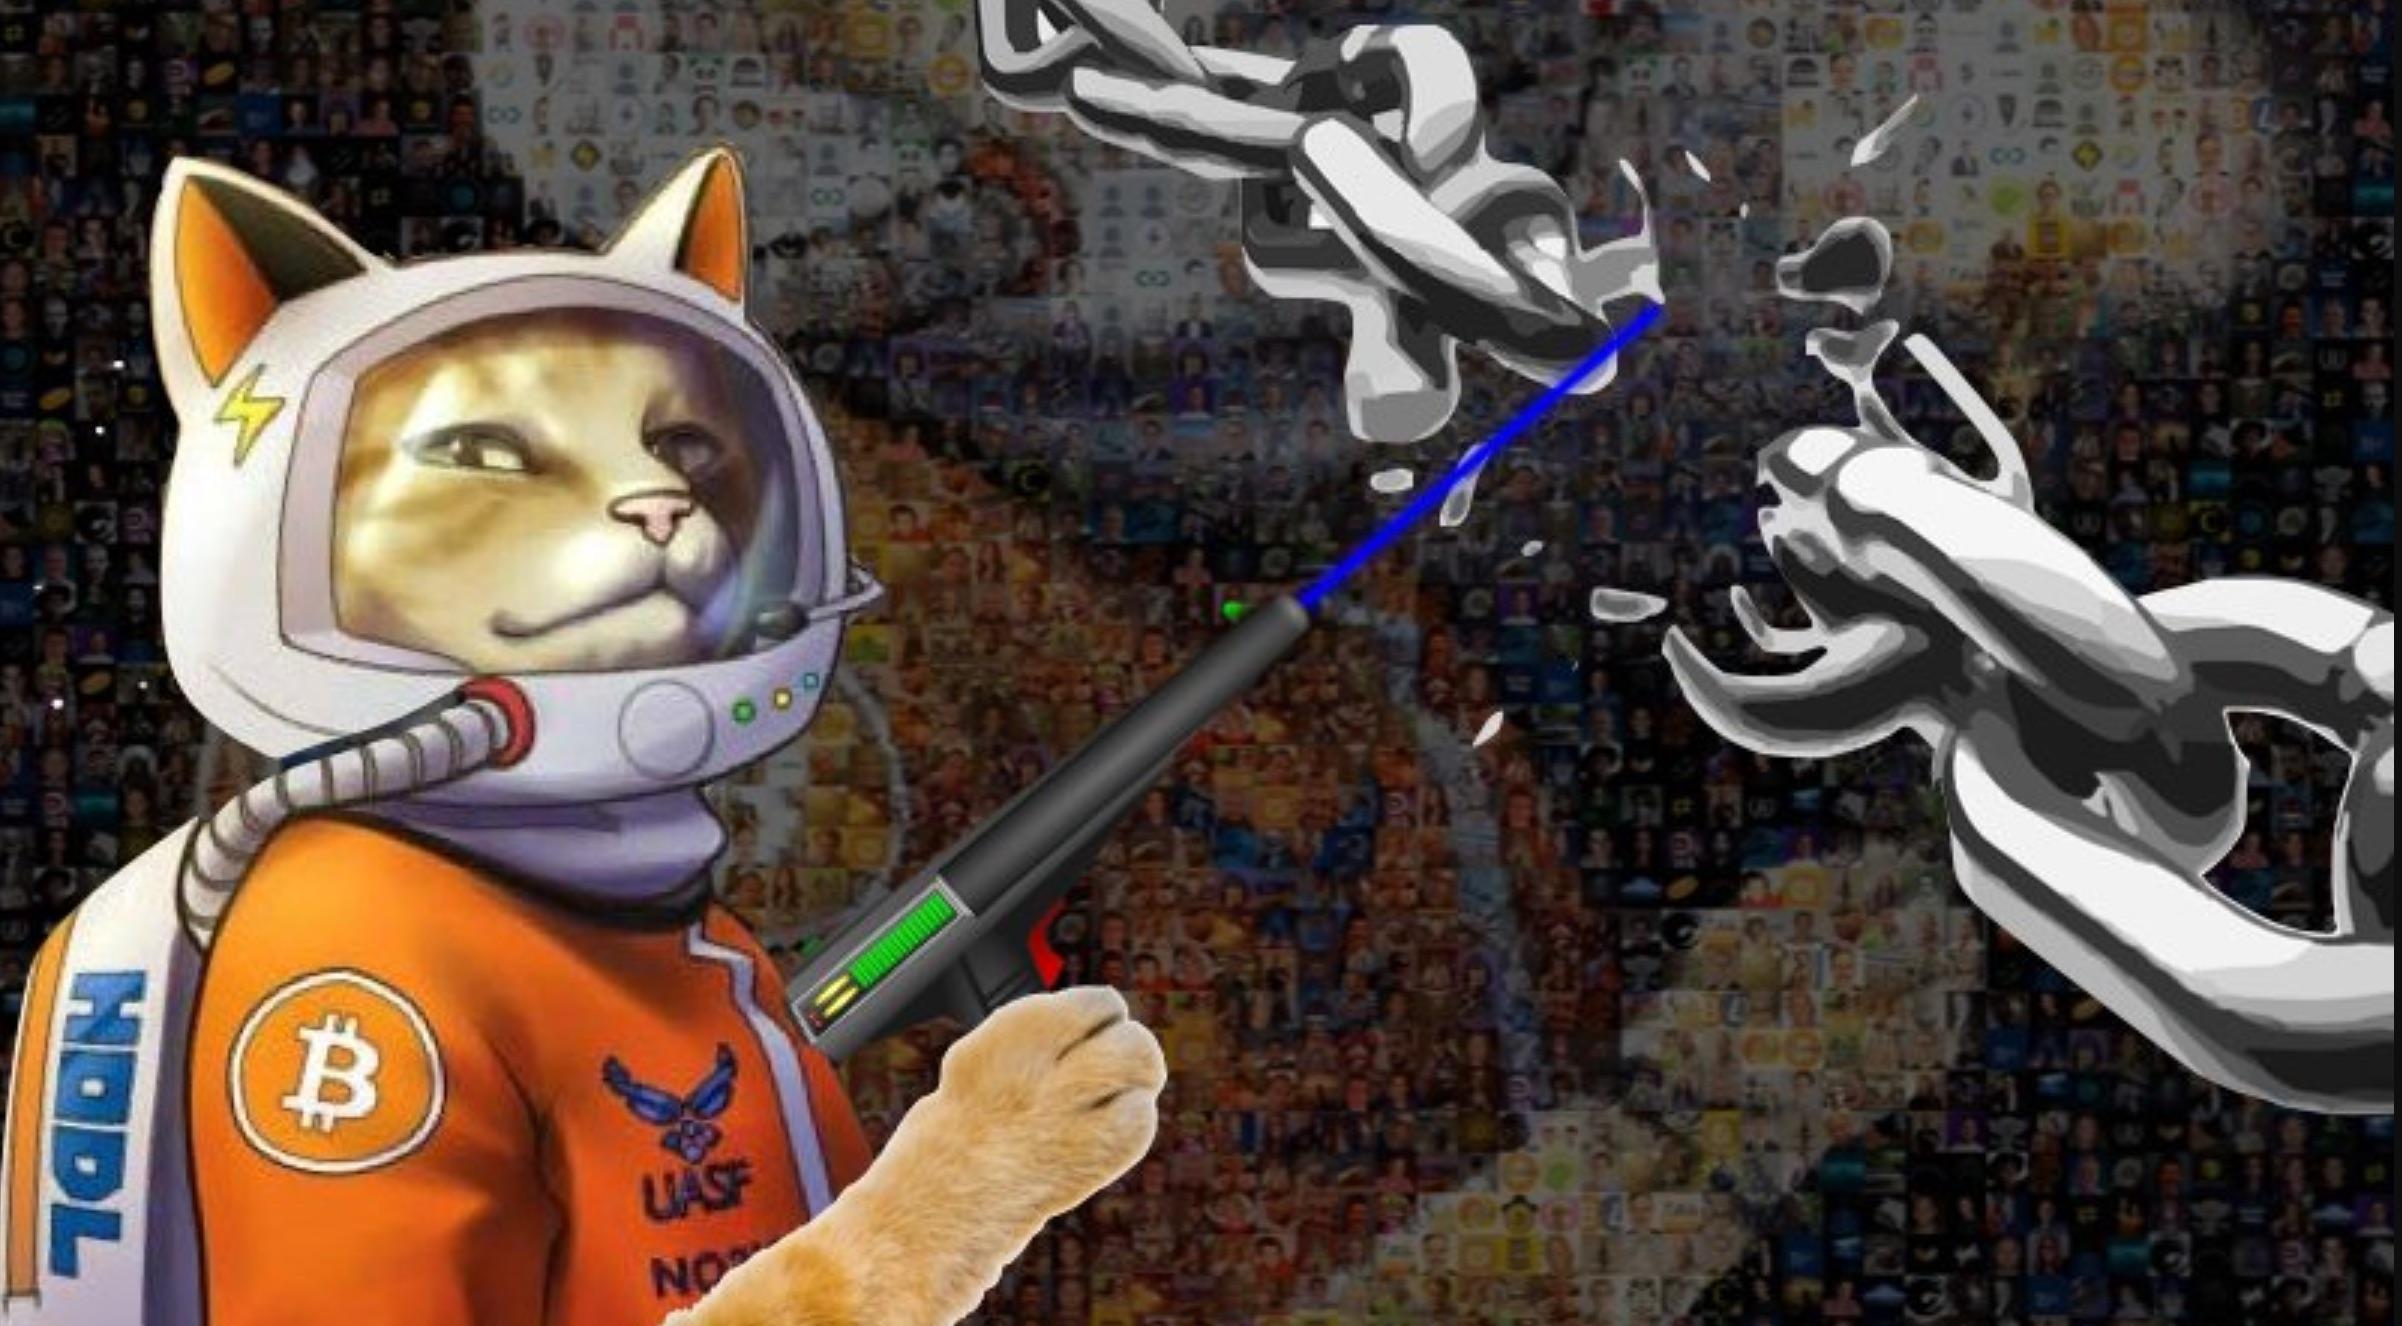 Craig Wright's Fight With a Cartoon Bitcoin Astronaut Cat Explained